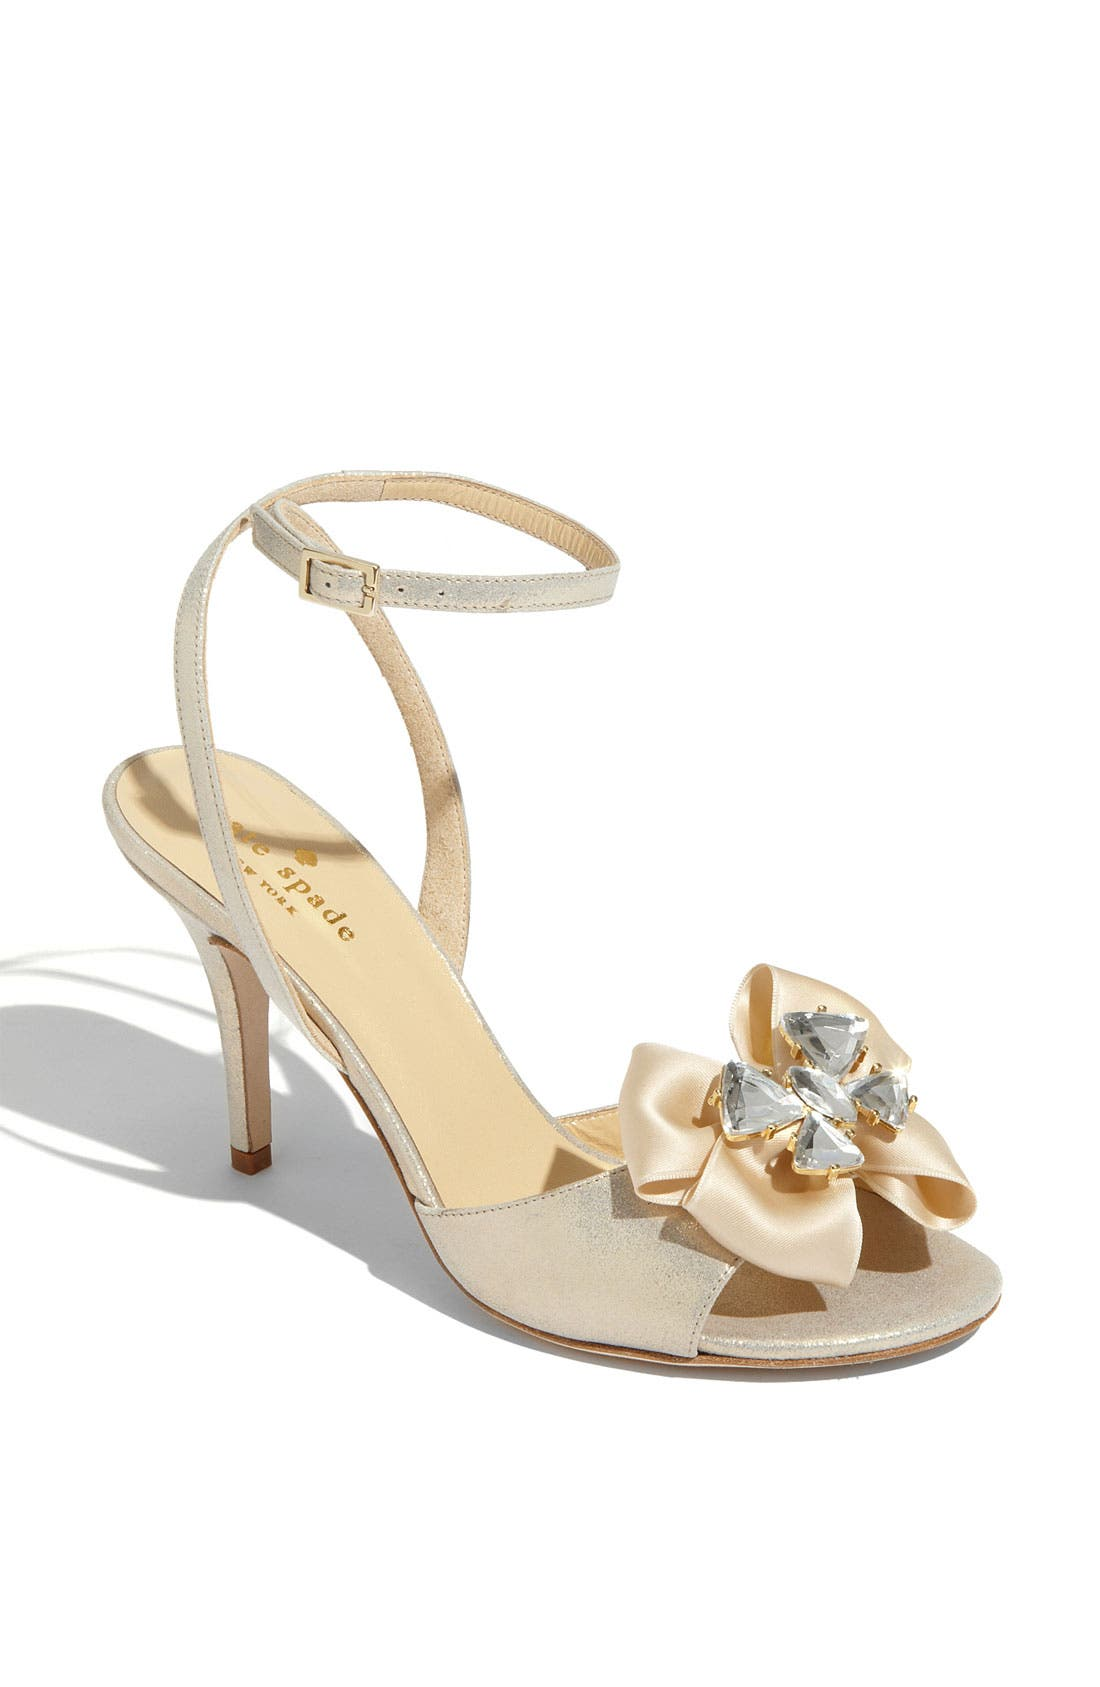 Main Image - kate spade new york 'shelby' sandal